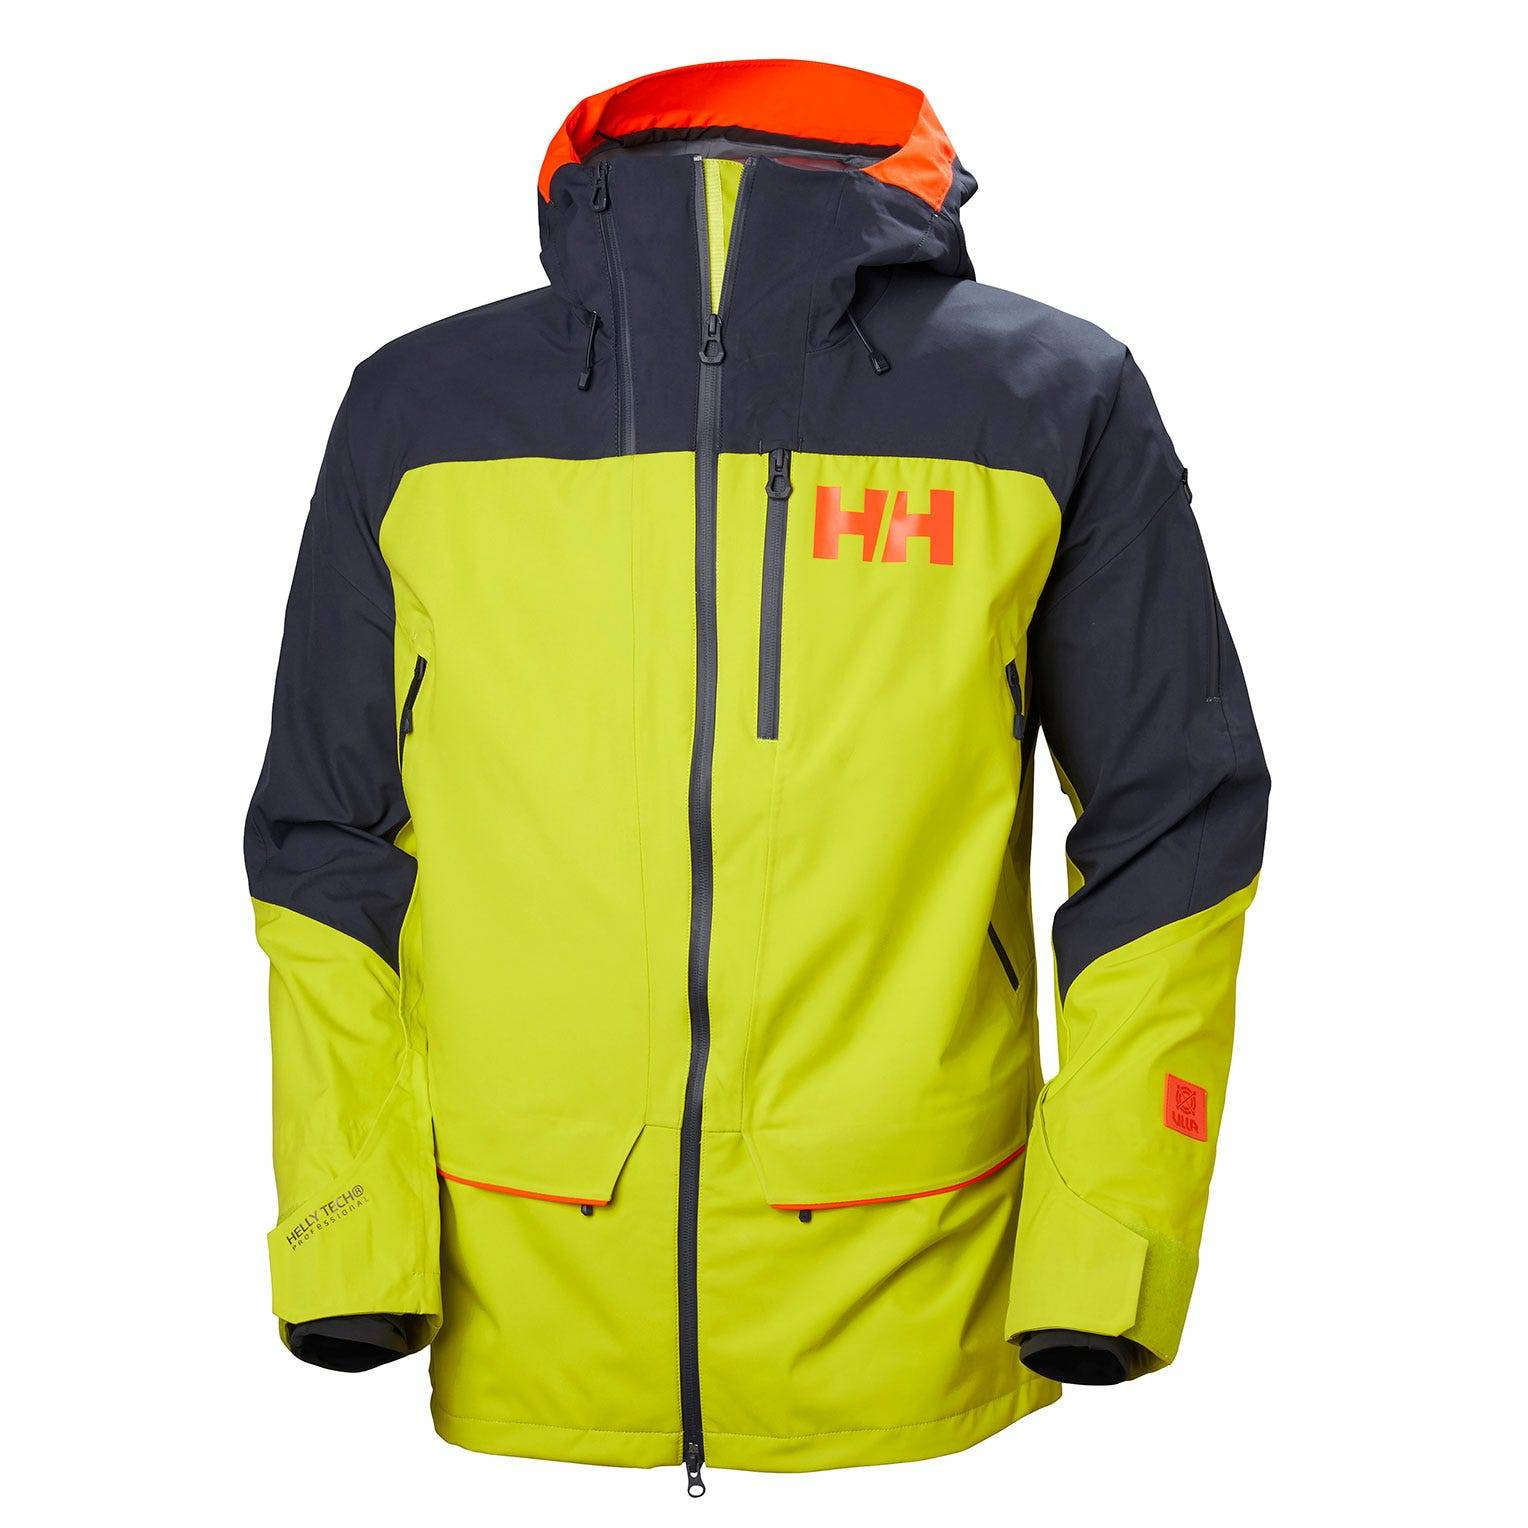 Helly Hansen Ridge Shell 2.0 Jacket Mens Ski Yellow S